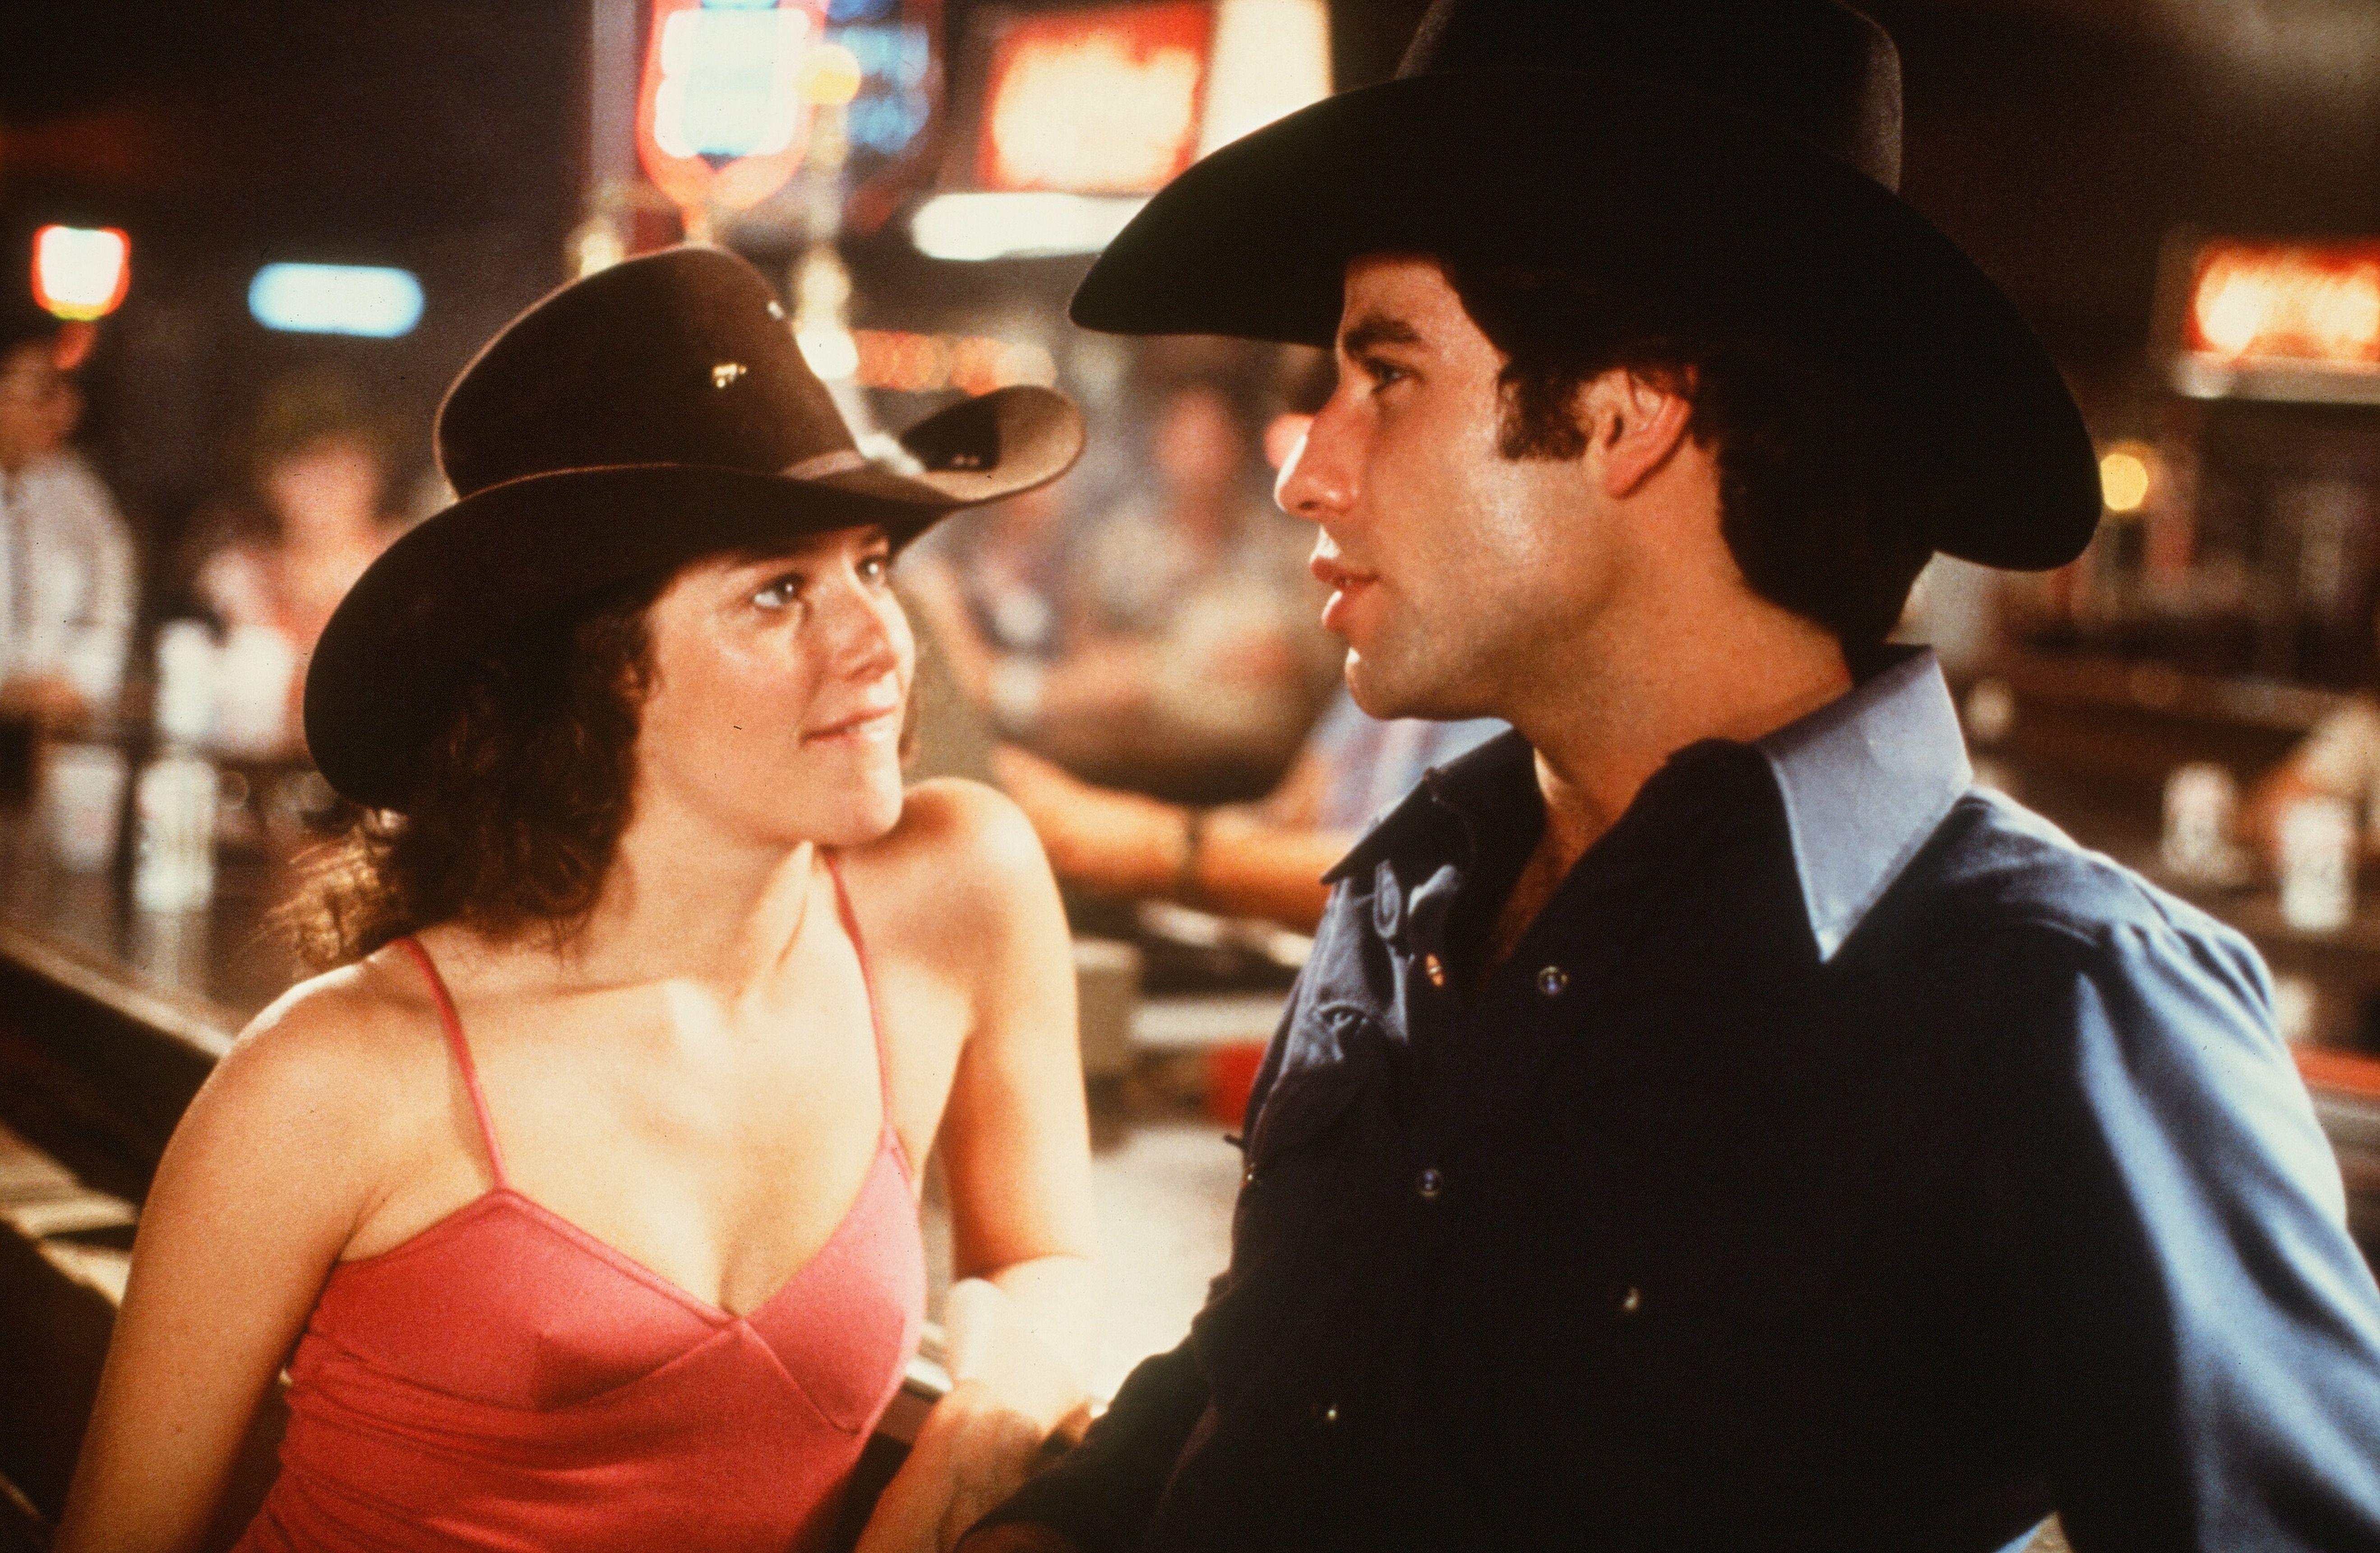 John Travolta and Debra Winger